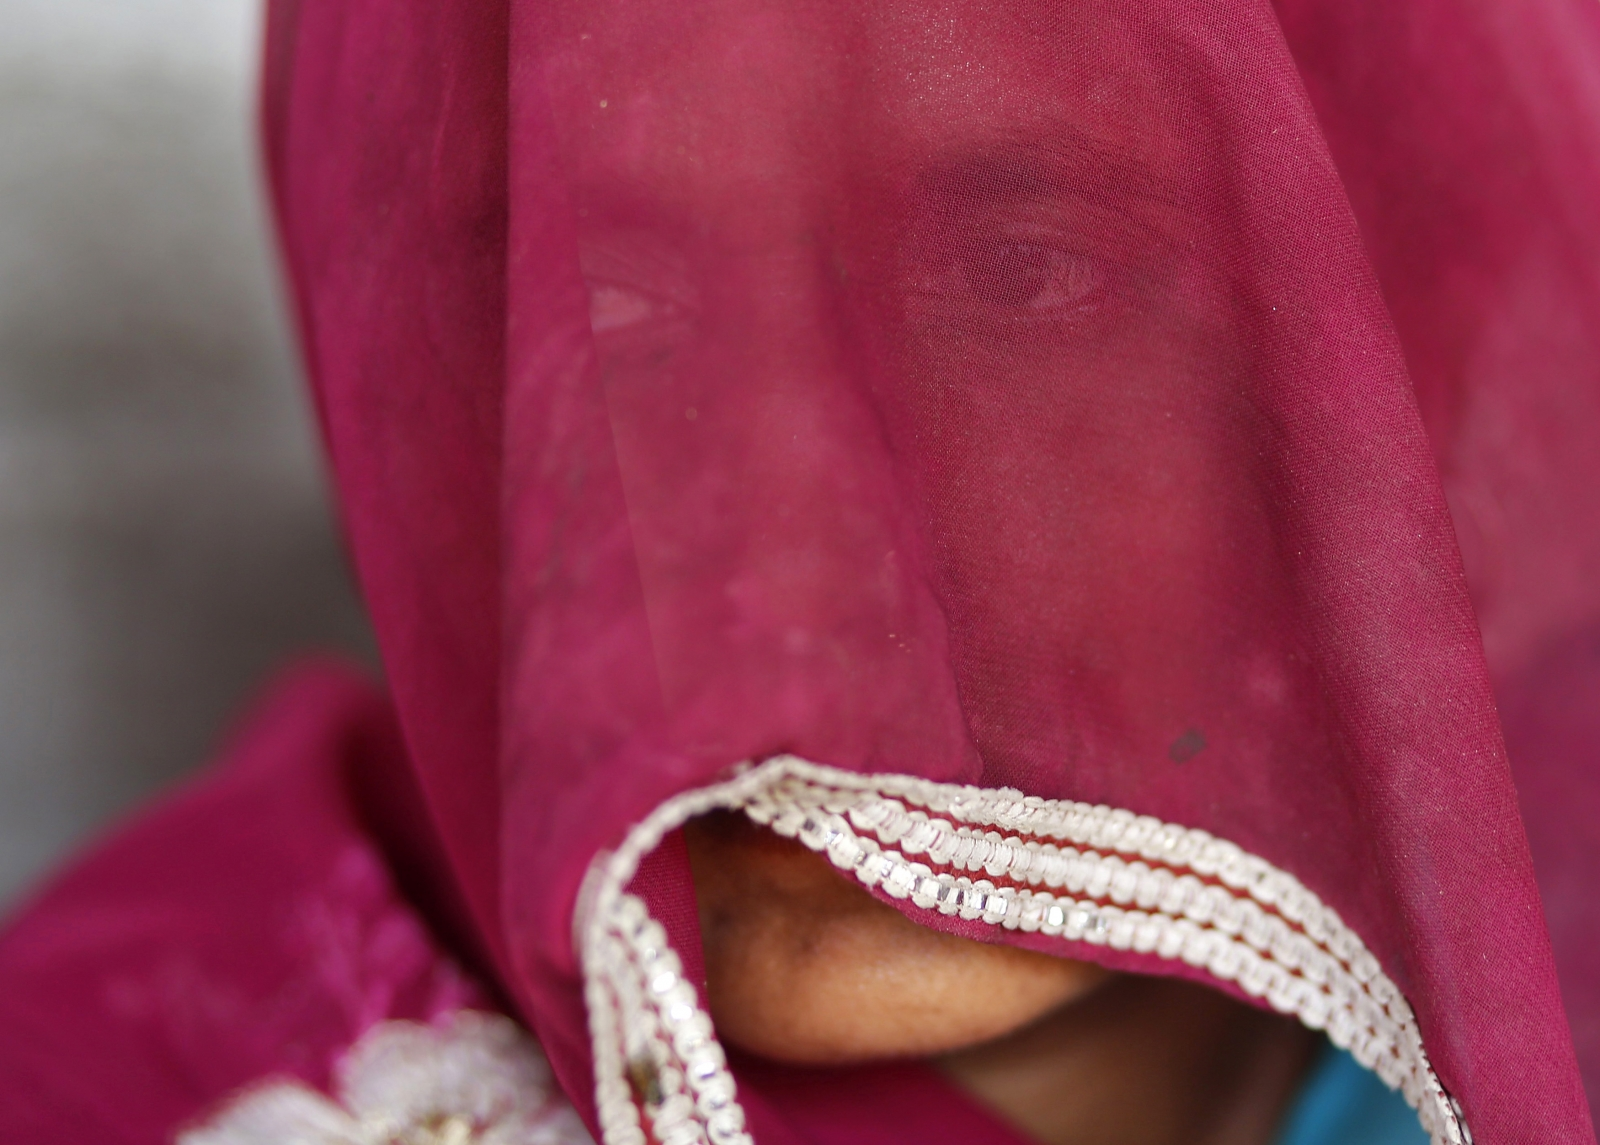 Uttar Pradesh murder victim mother